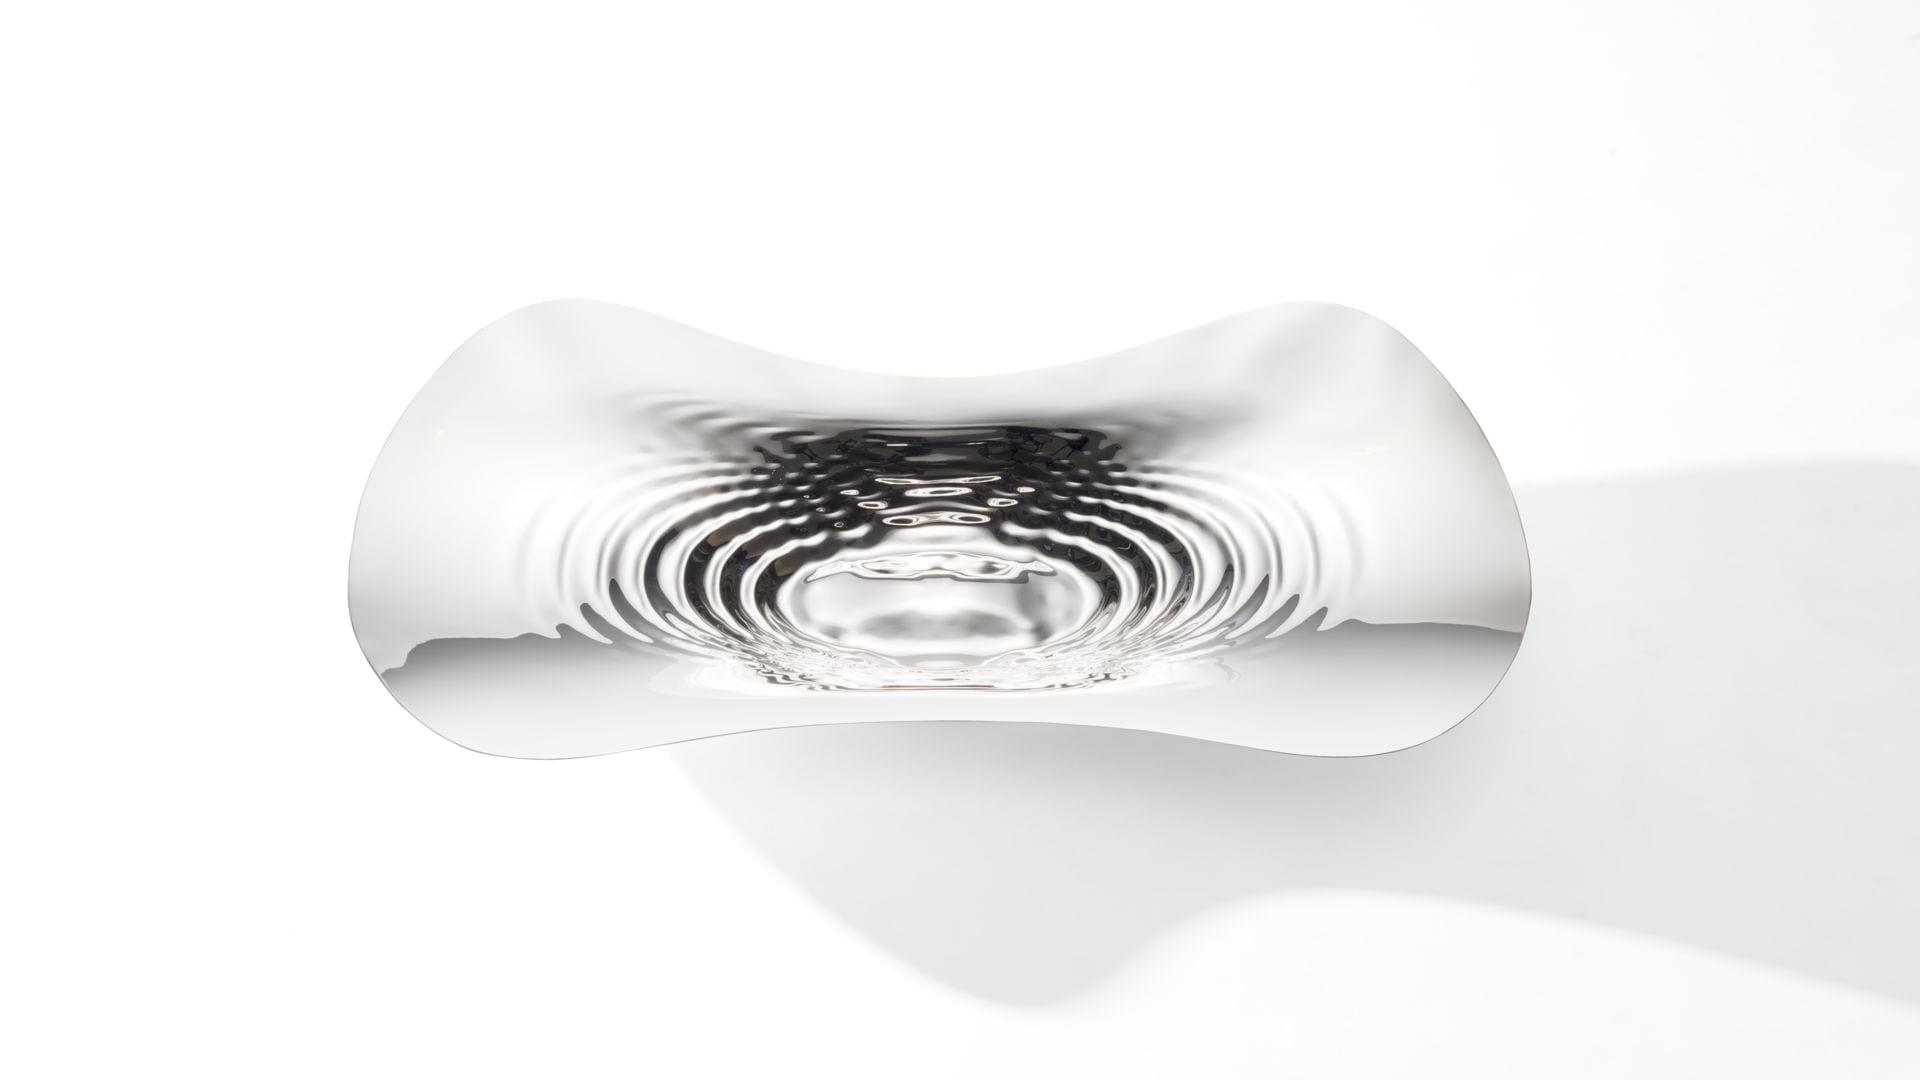 ZHD_Bowl Silver Liquid Glacial-152317-HIGH-RES